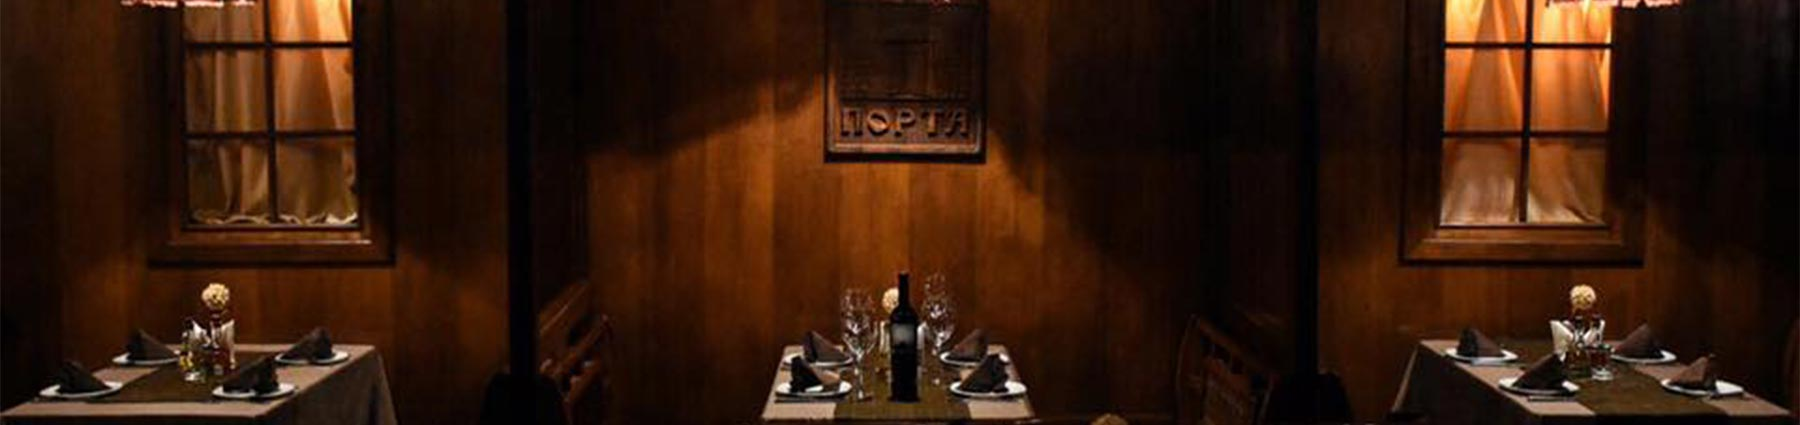 Ресторан Порта Прилеп